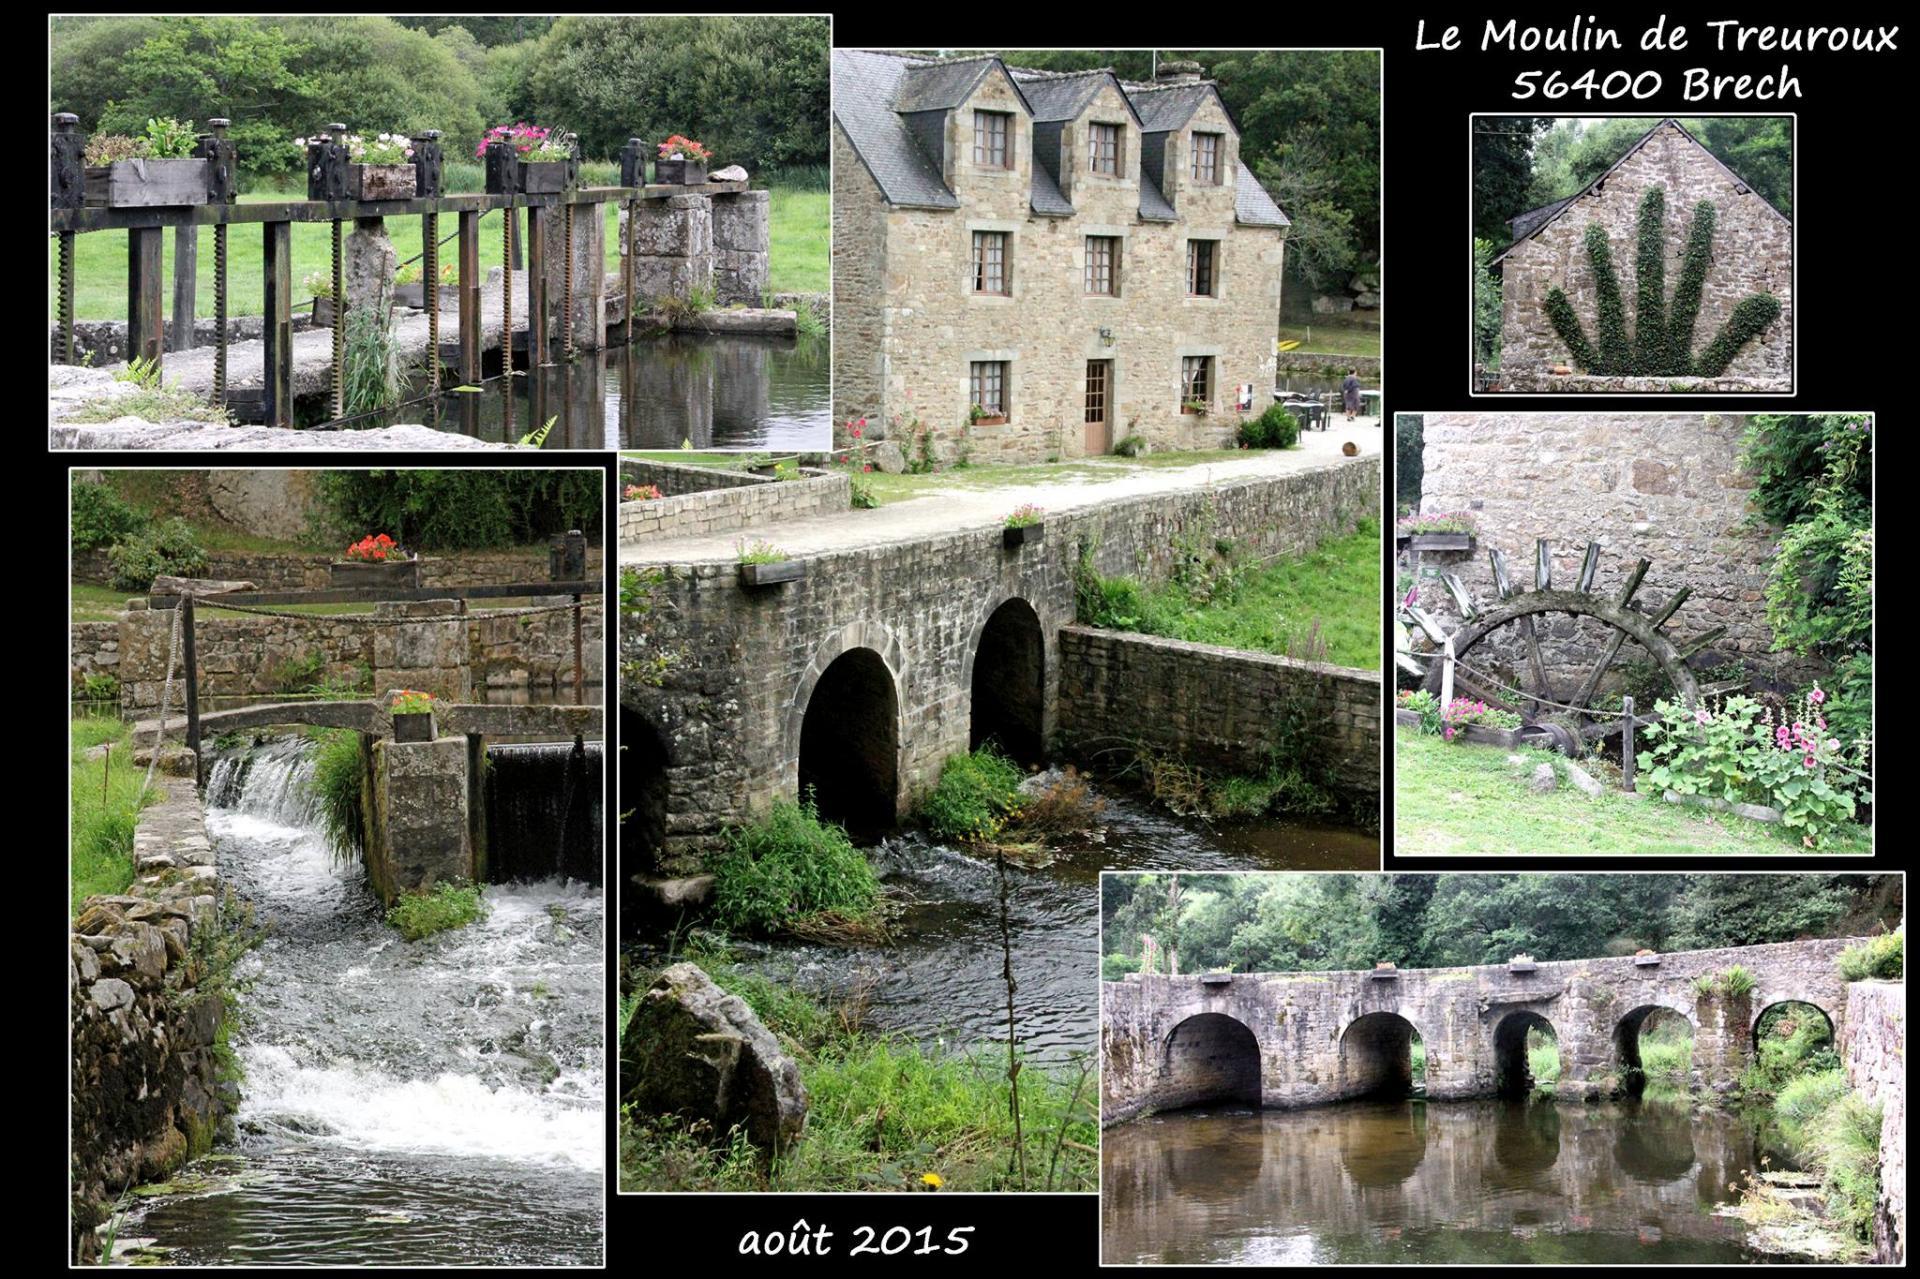 Moulin de treuroux